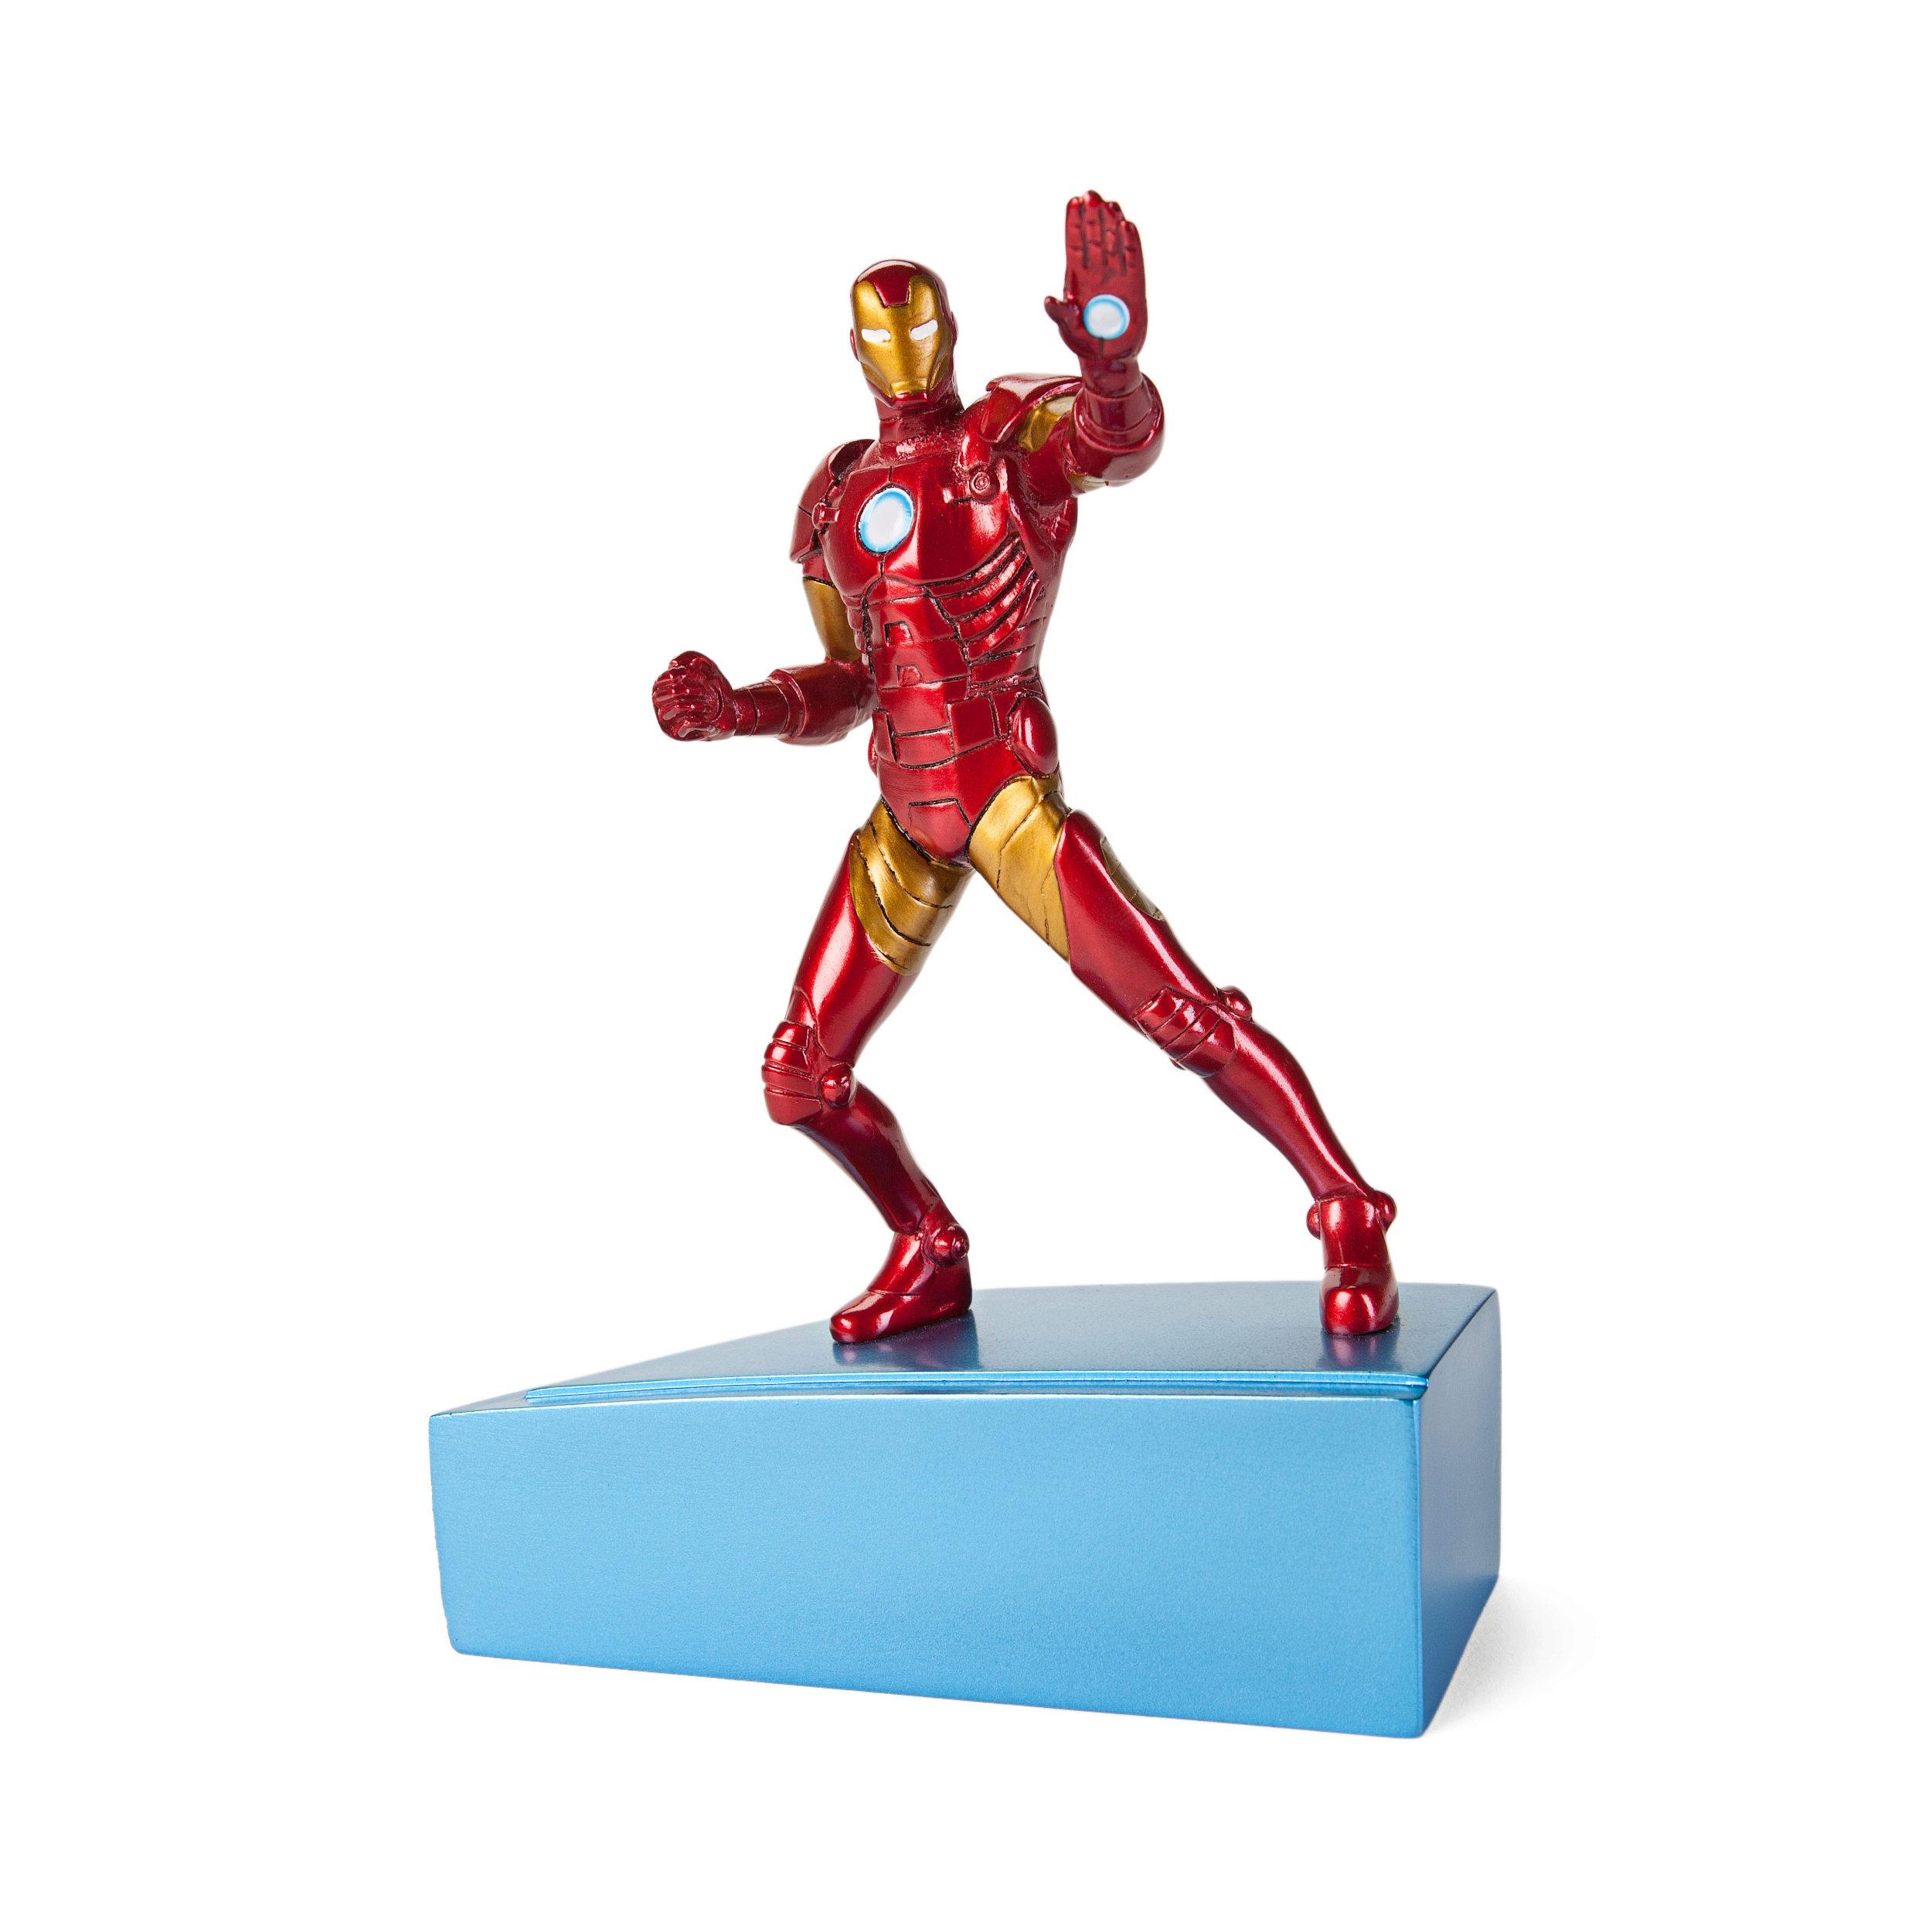 Marvel Avengers Iron Man Paperweight Figure